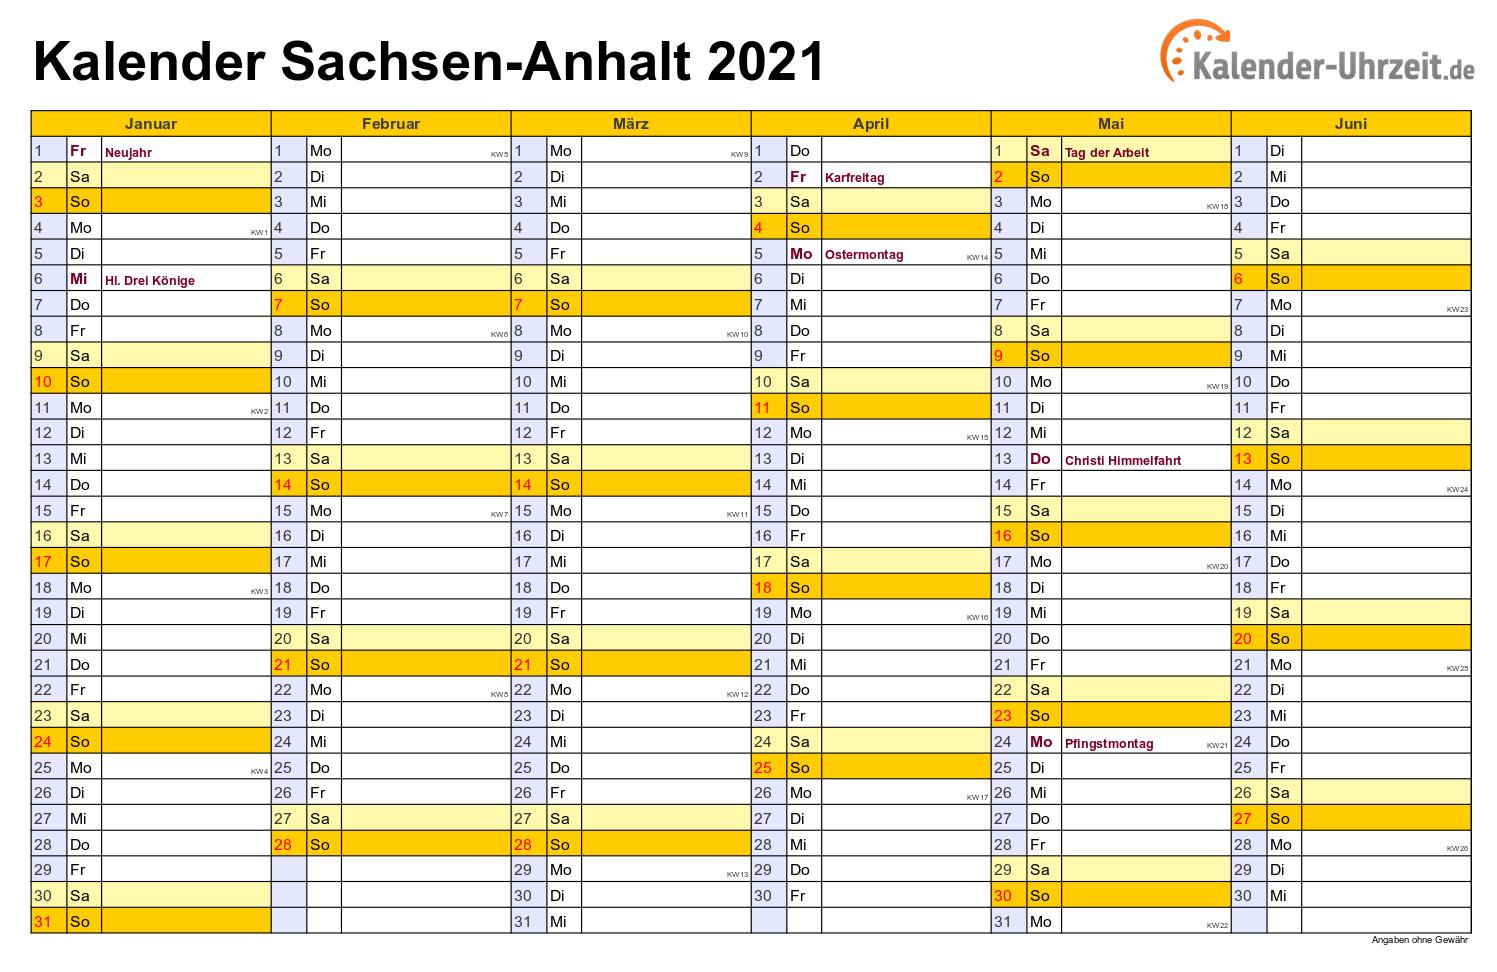 Landespokal Sachsen-Anhalt 2021